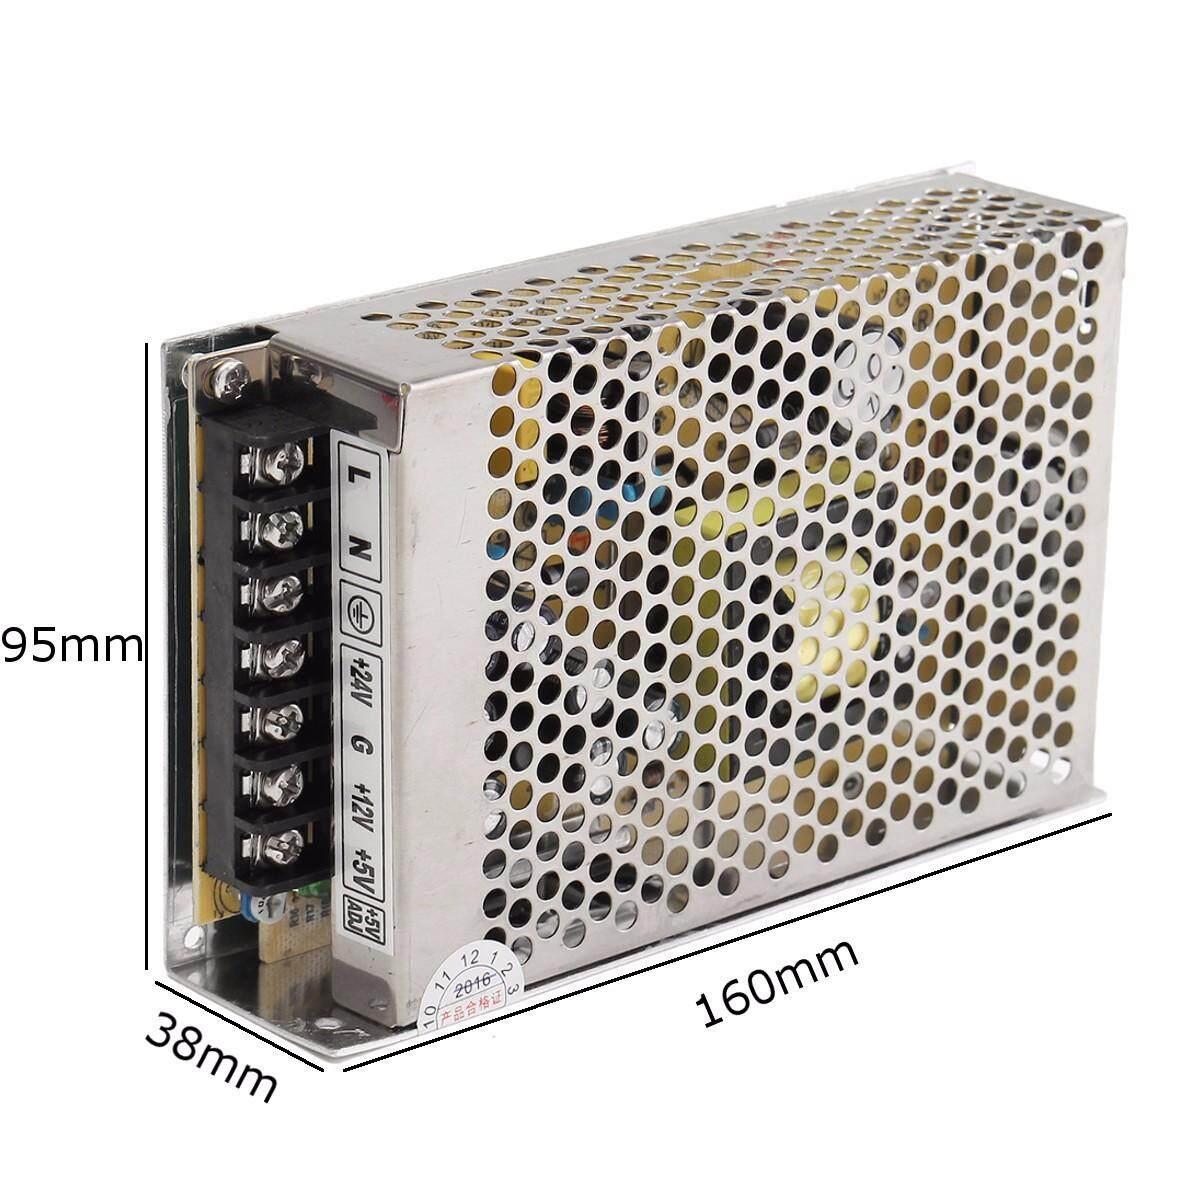 Output 5V/12V/24V 1.5A 2A 7A Switching Power Supply For Jamma Arcade/ Pinball